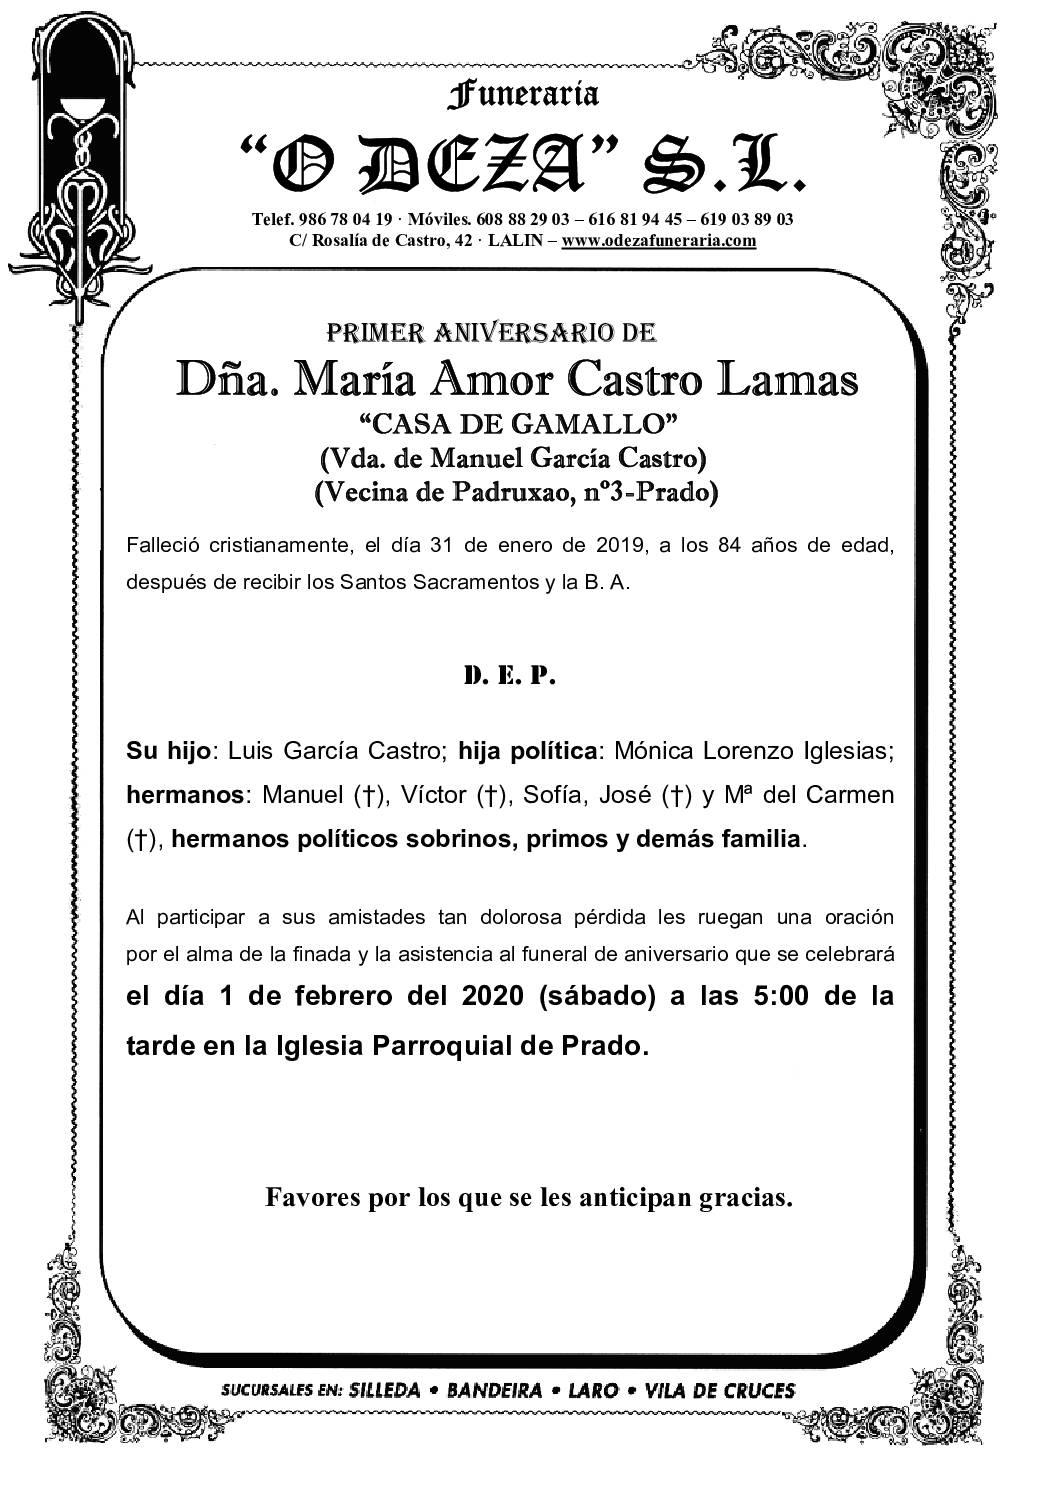 DÑA. Mª AMOR CASTRO LAMAS